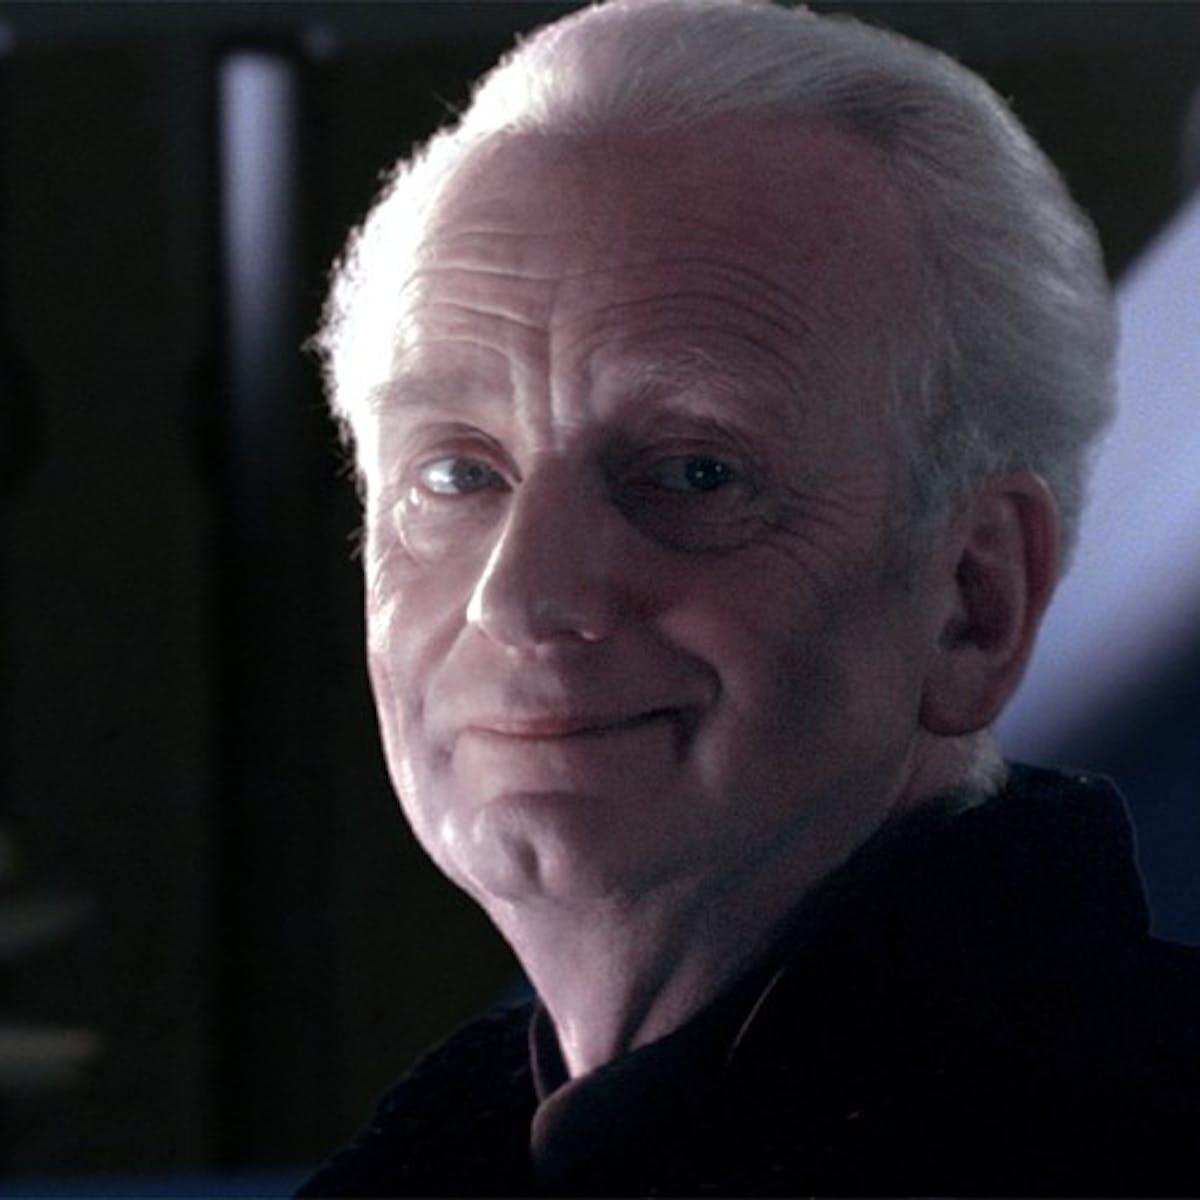 James Earl Jones 'Rise of Skywalker' cameo reveals huge Palpatine twist